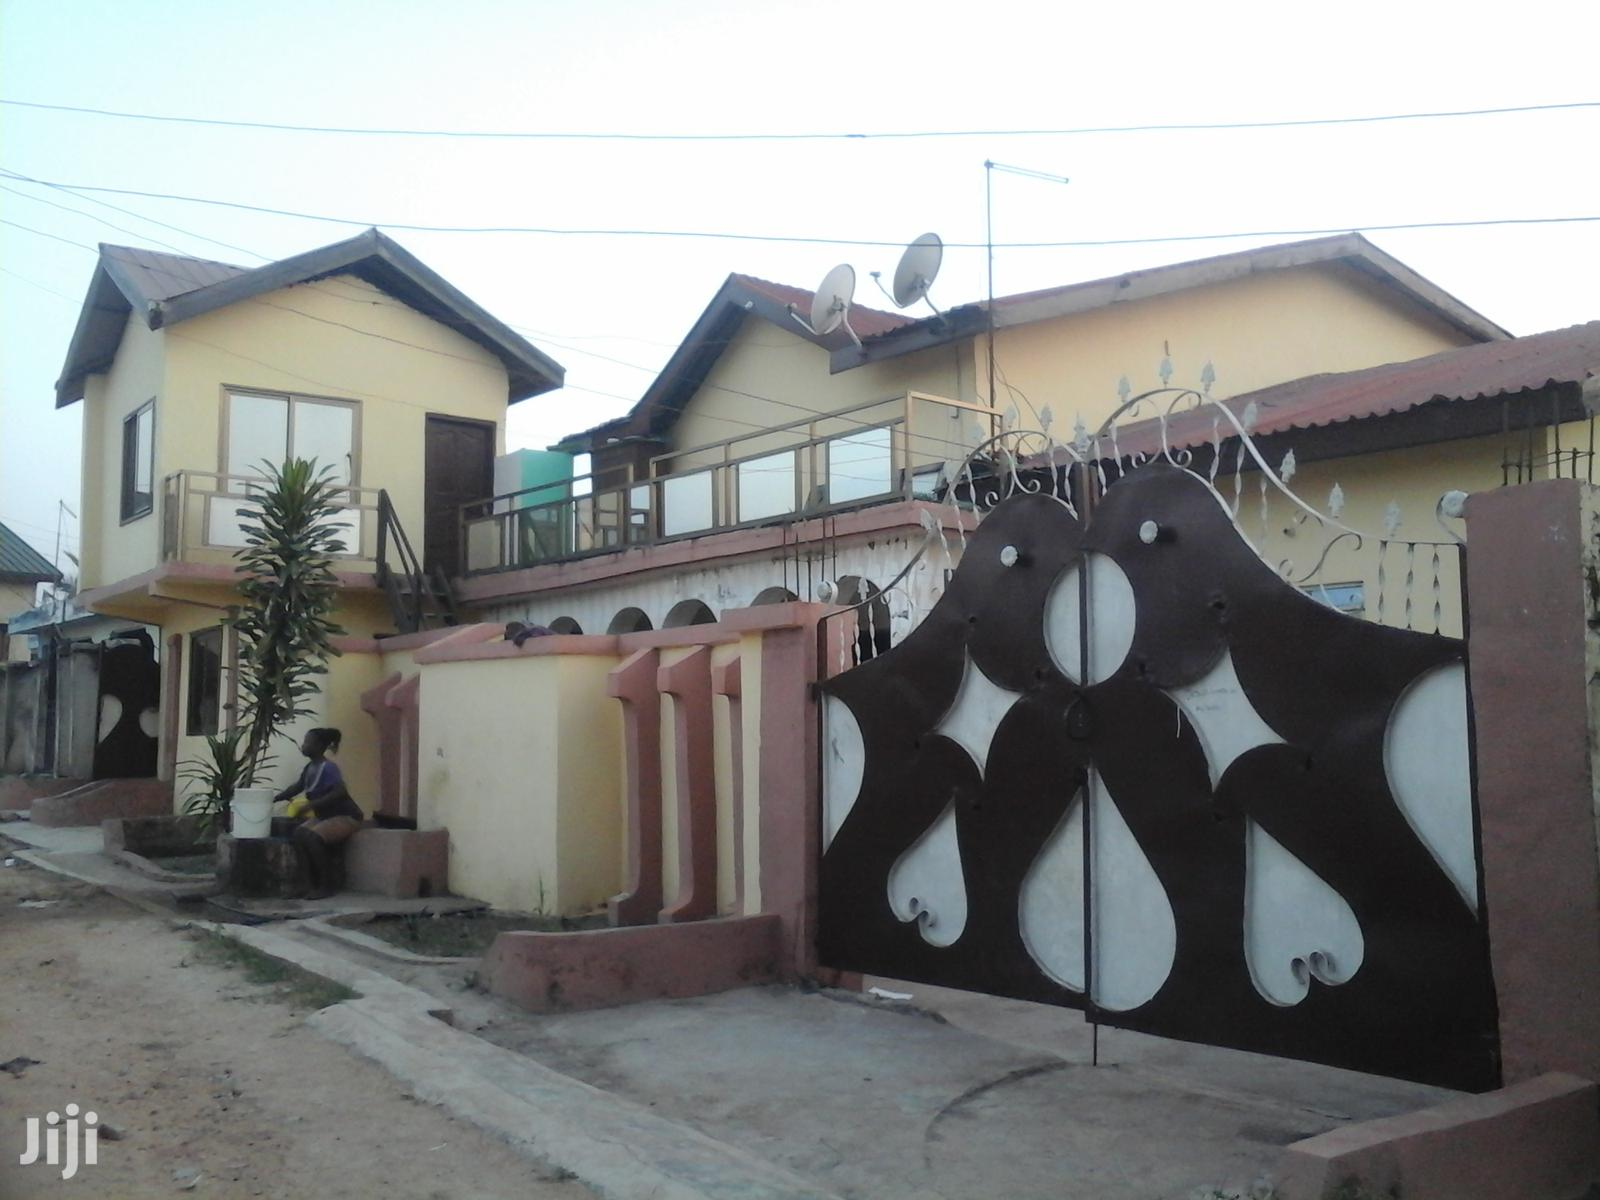 9-Bedroom House for Sale at Sokoban New Site, Kumasi